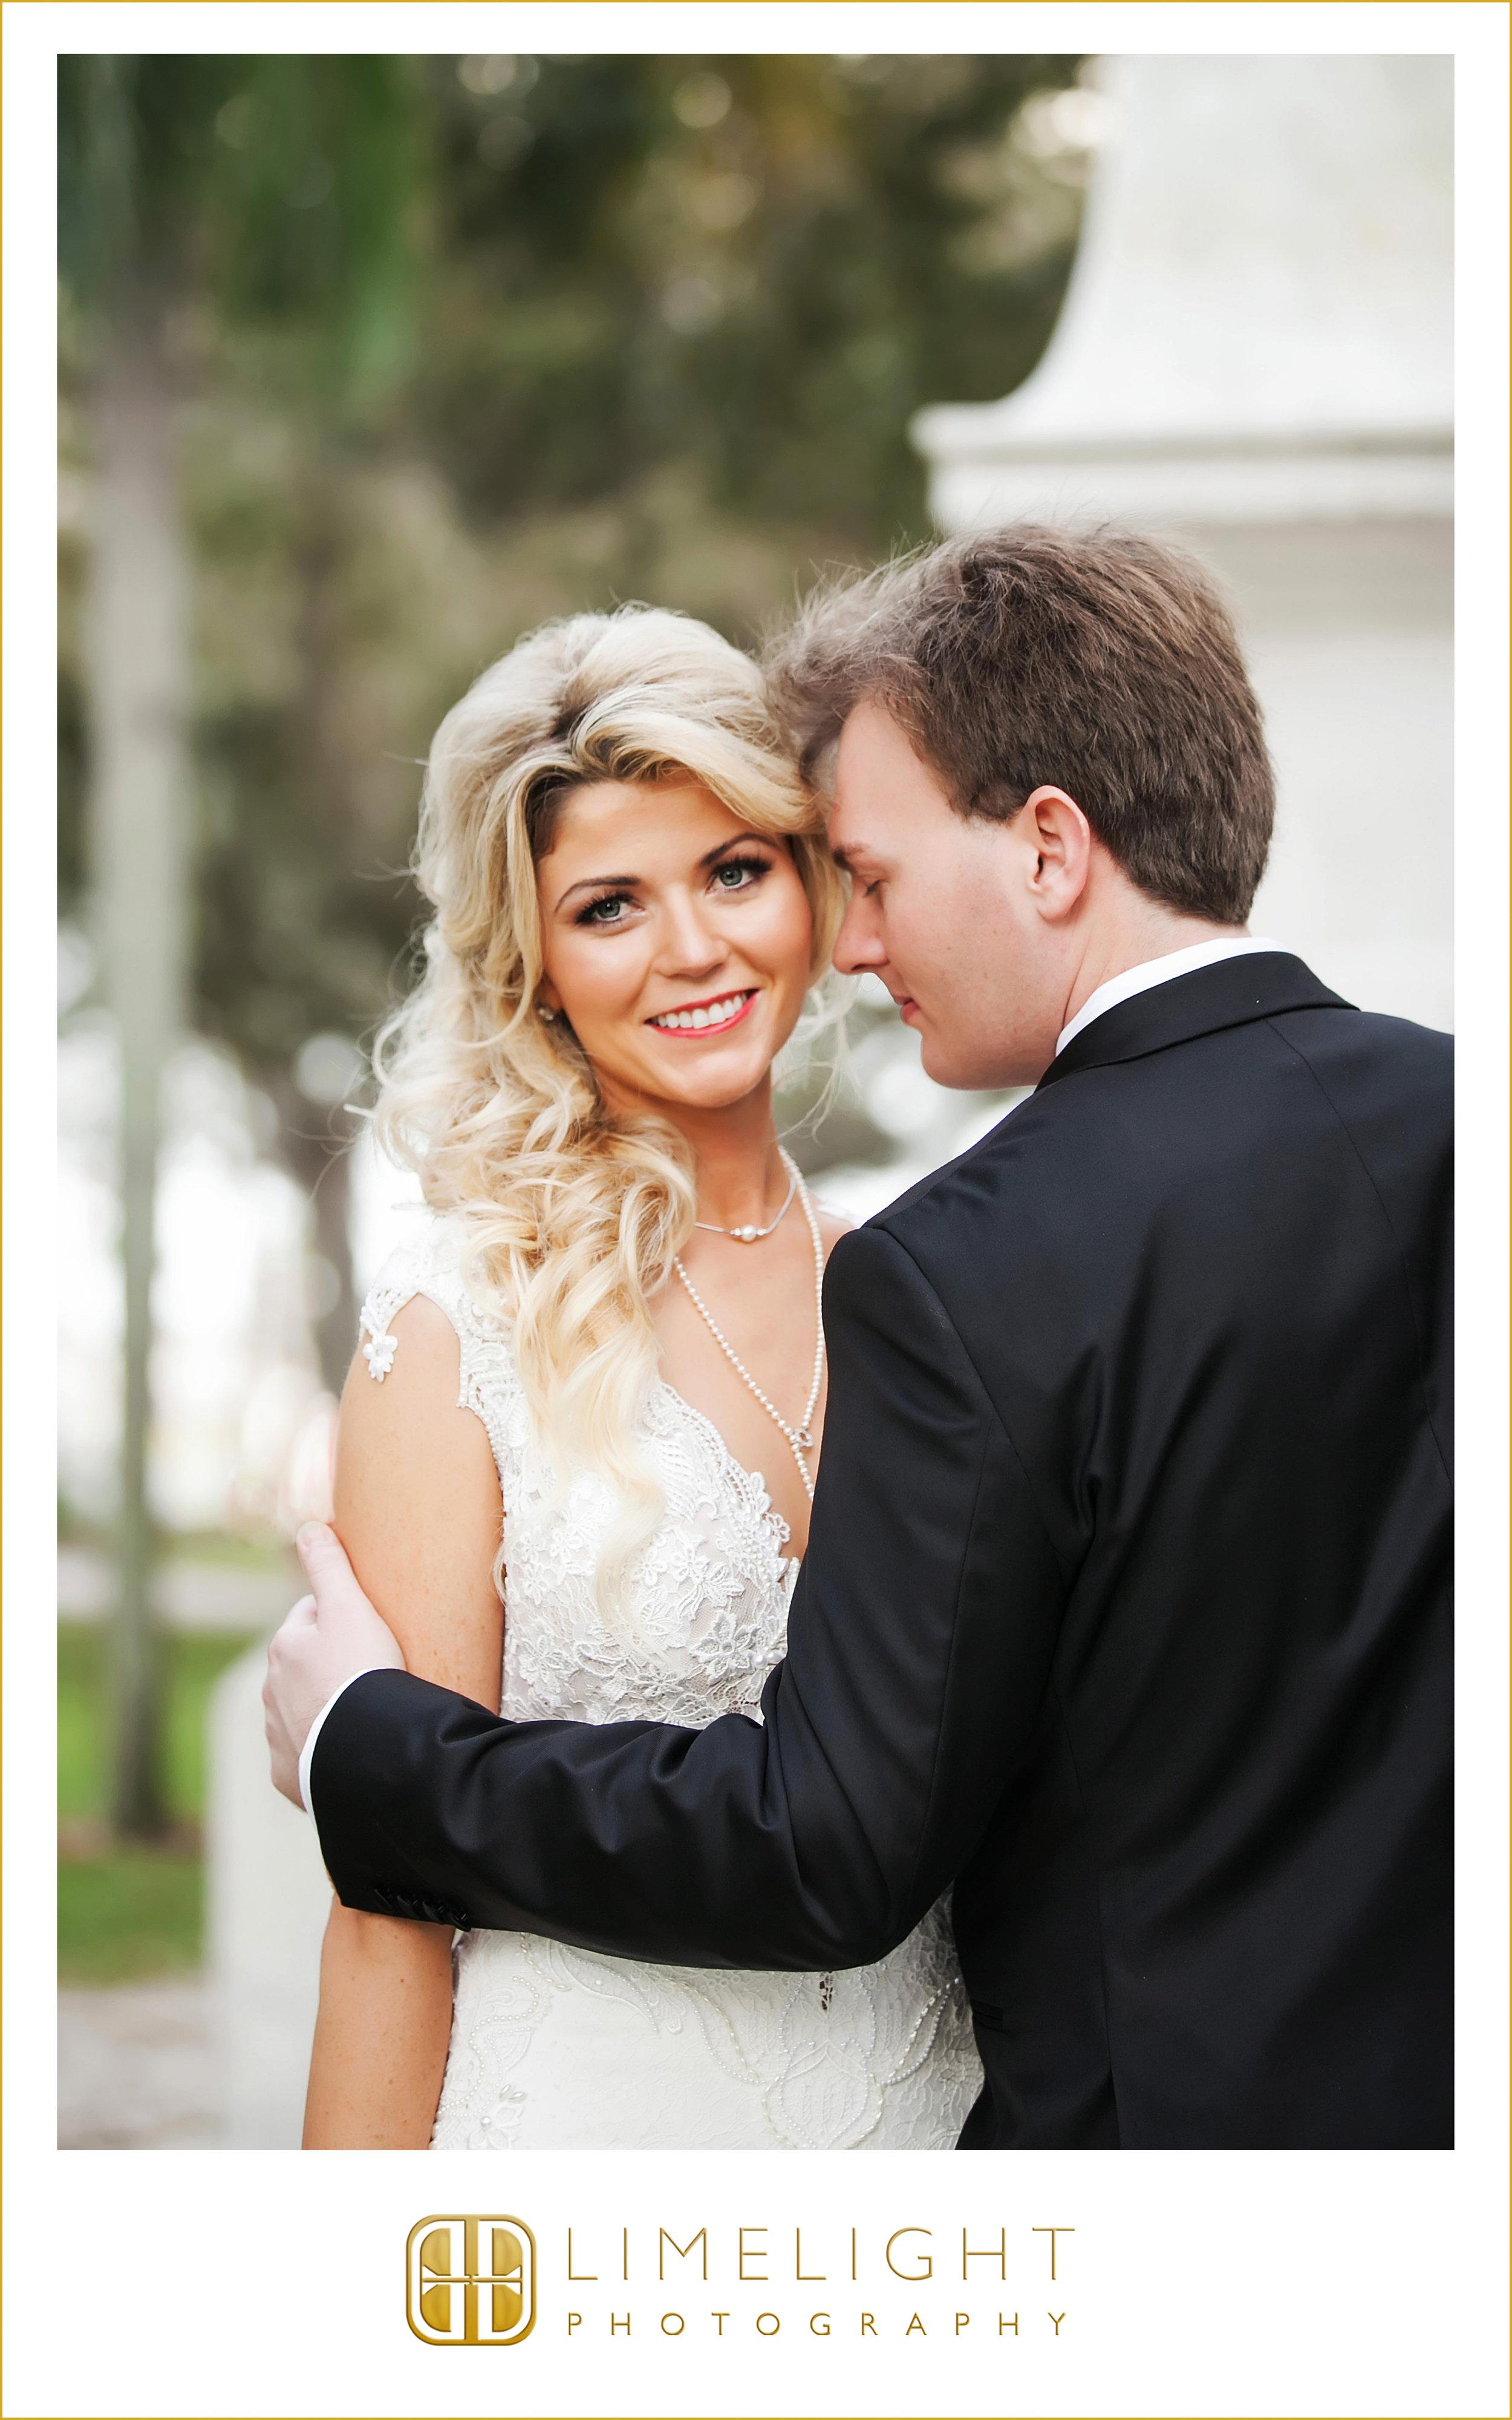 Portraits | Mr. & Mrs. | Wedding